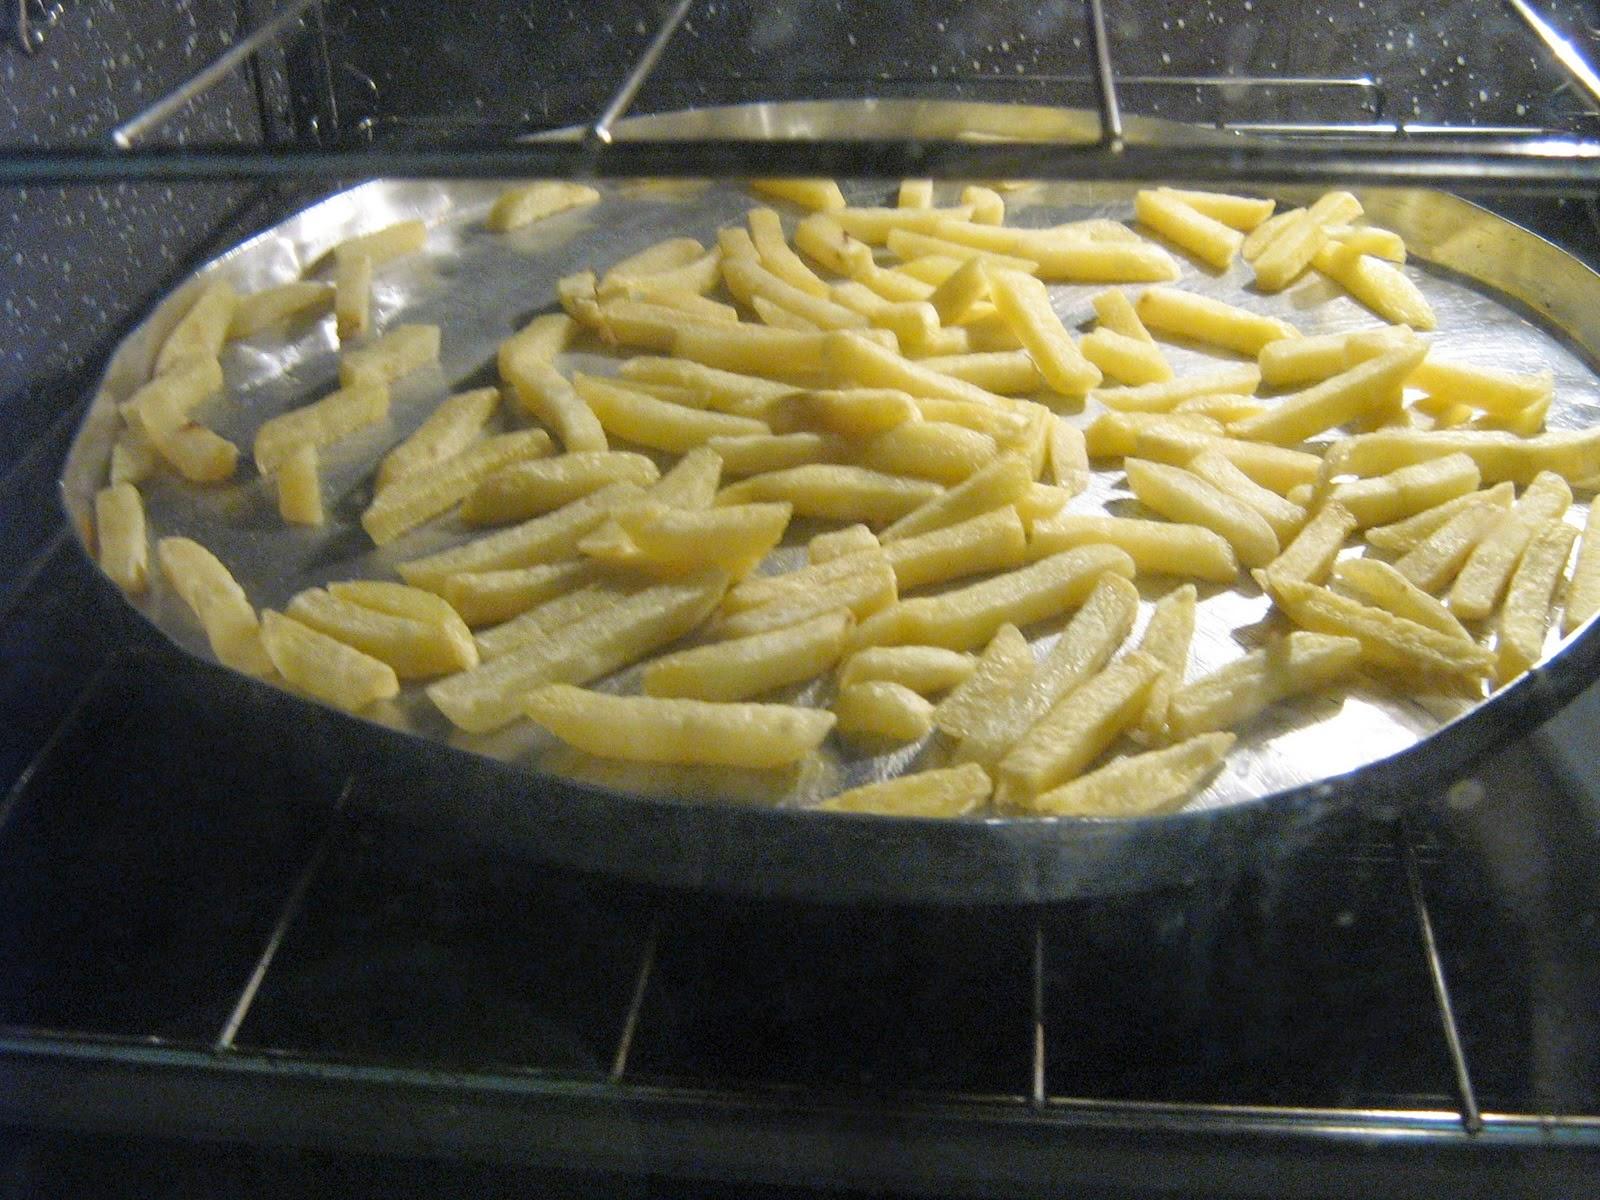 Batata palito congelada assada.